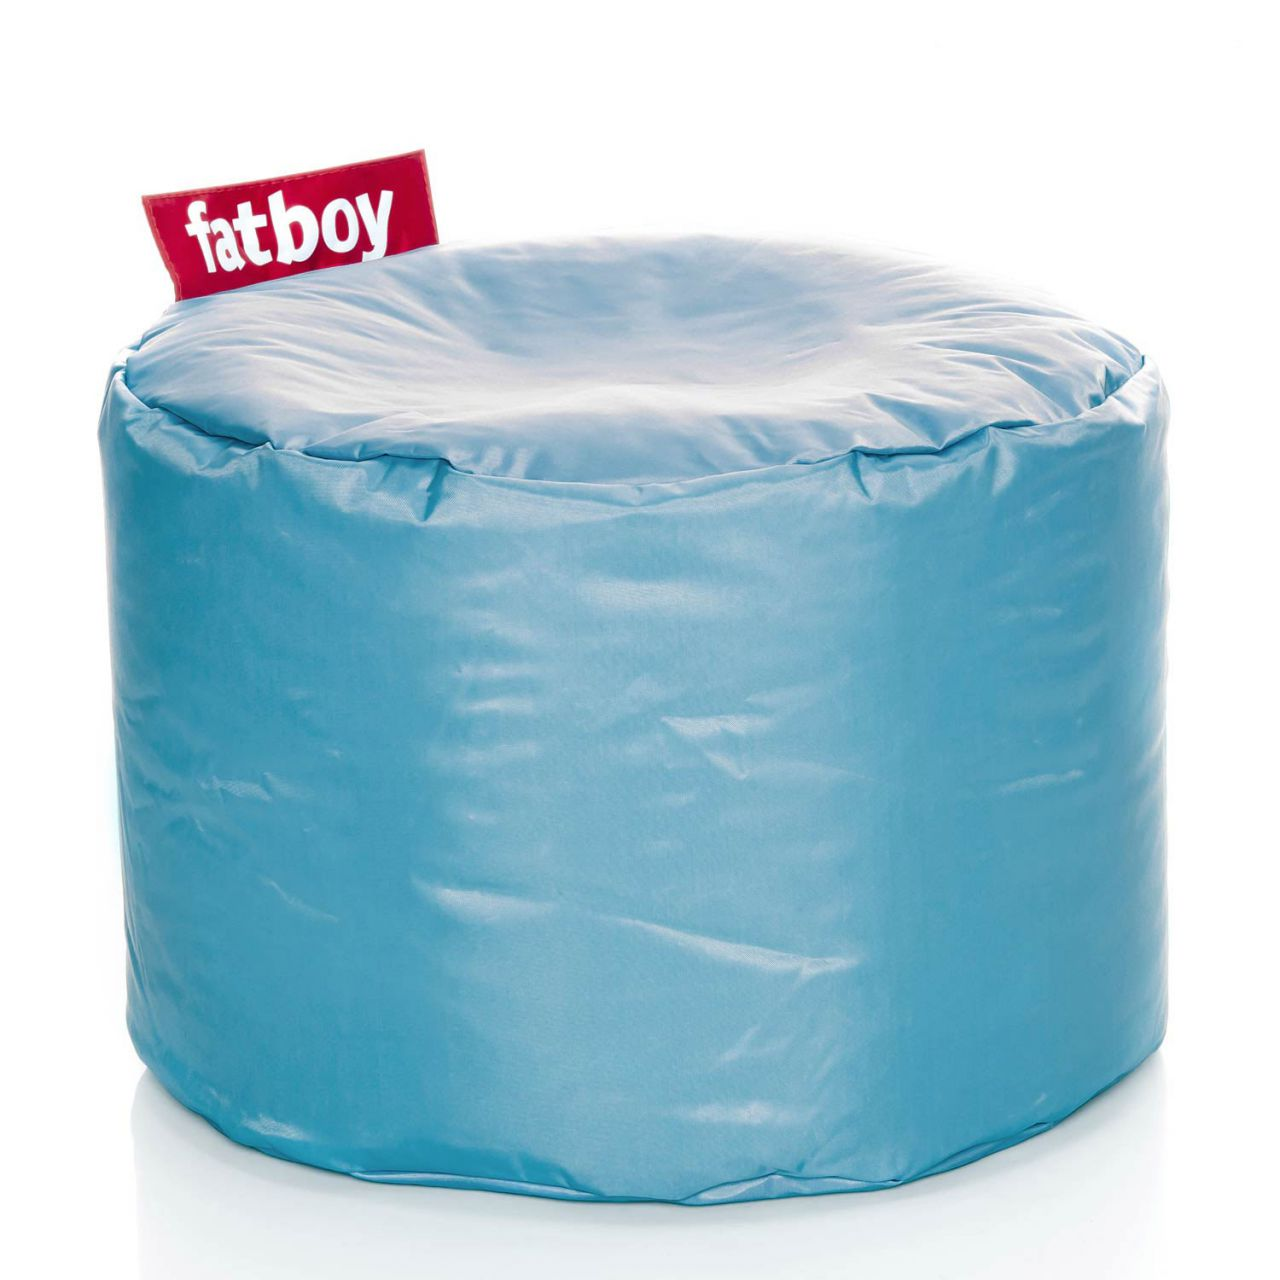 Fatboy - Point Sitzhocker 900.0153